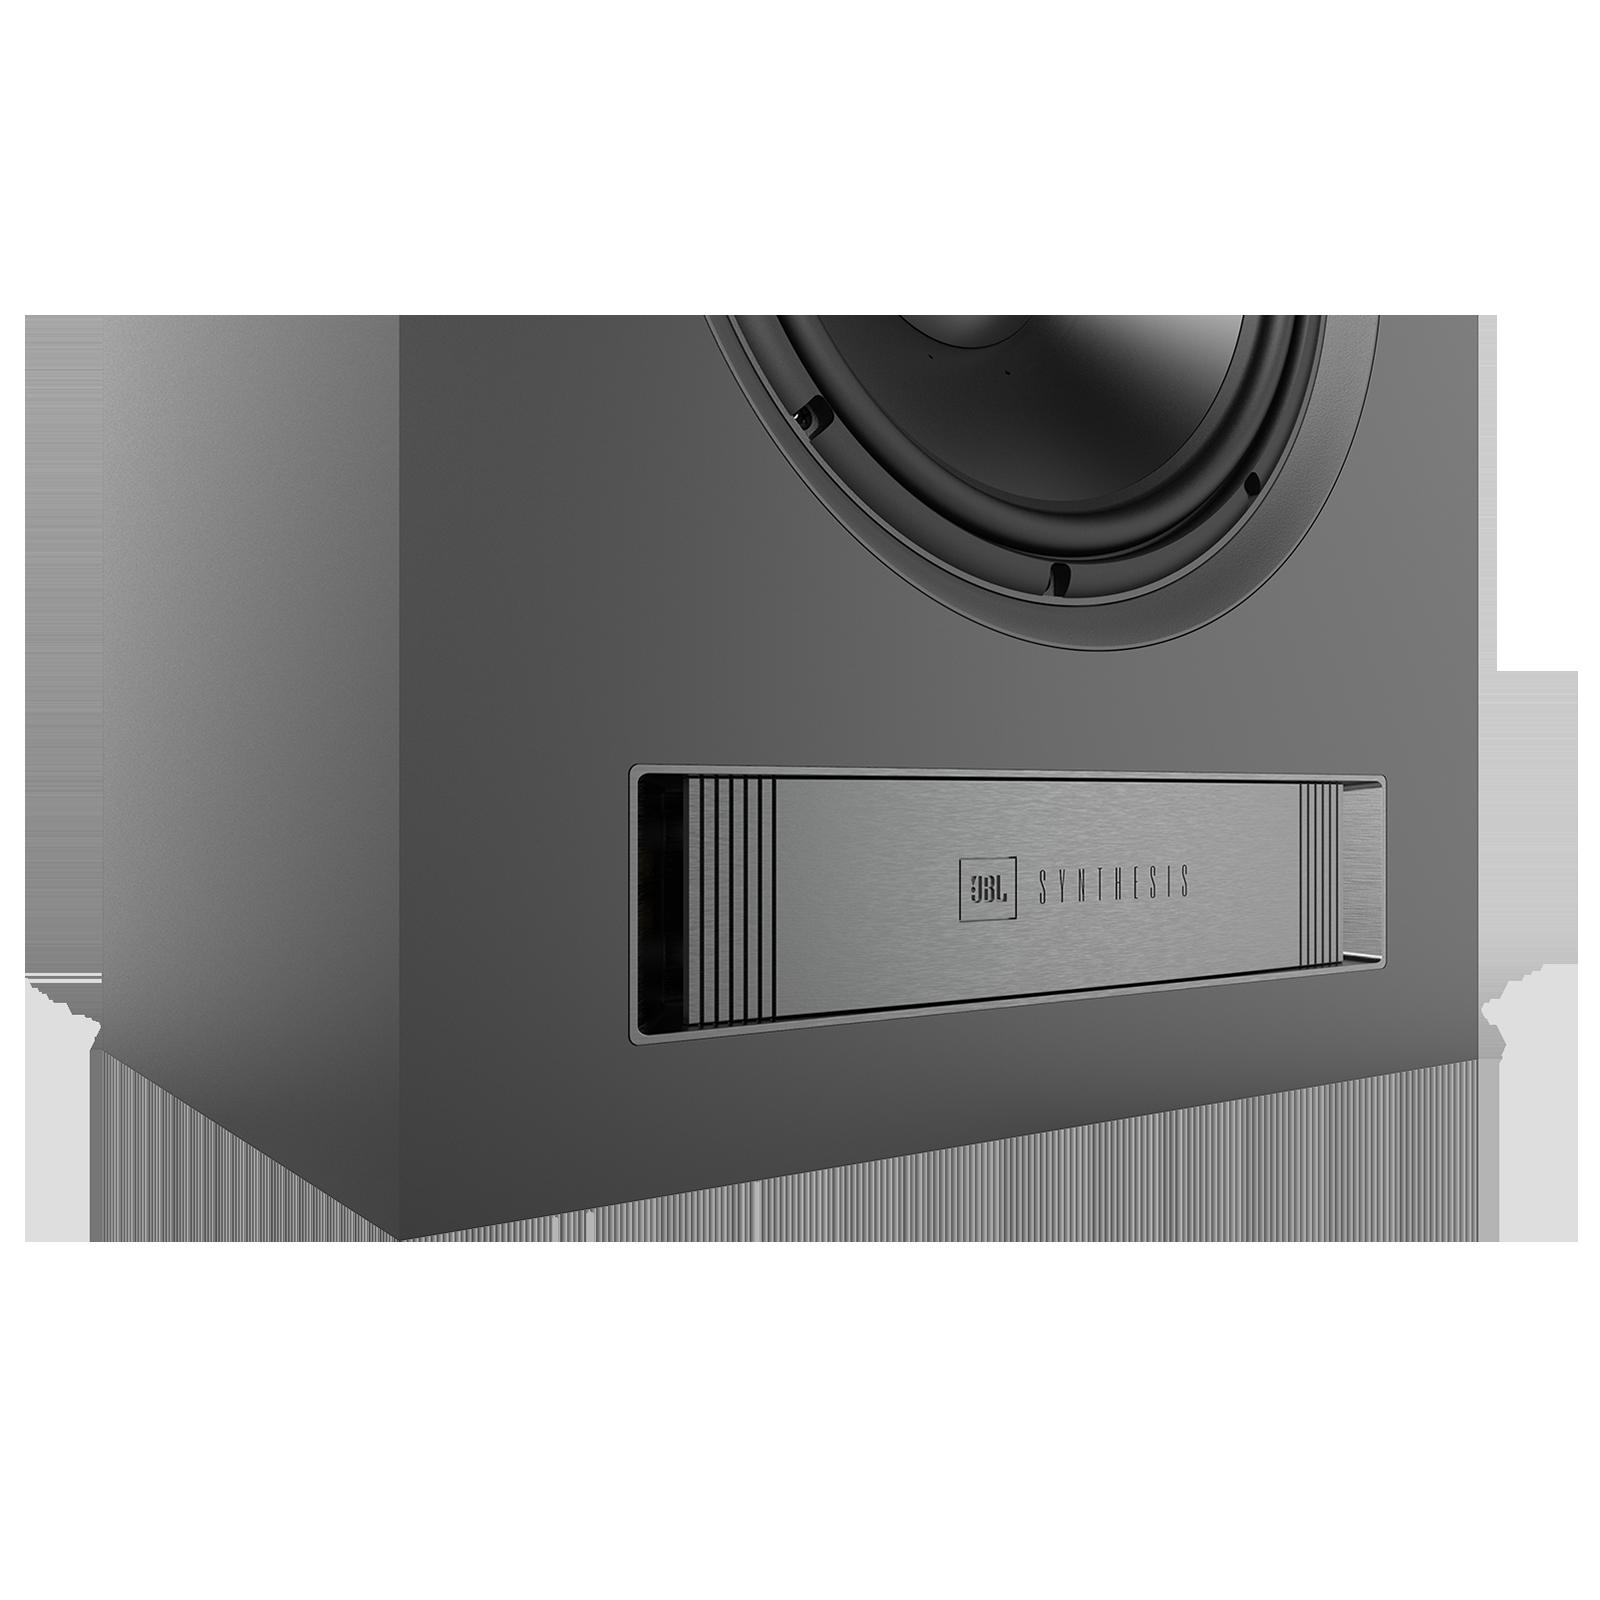 SCL-1 - Black - 2-Way Dual 12-inch (300mm) Custom LCR Loudspeaker - Detailshot 5